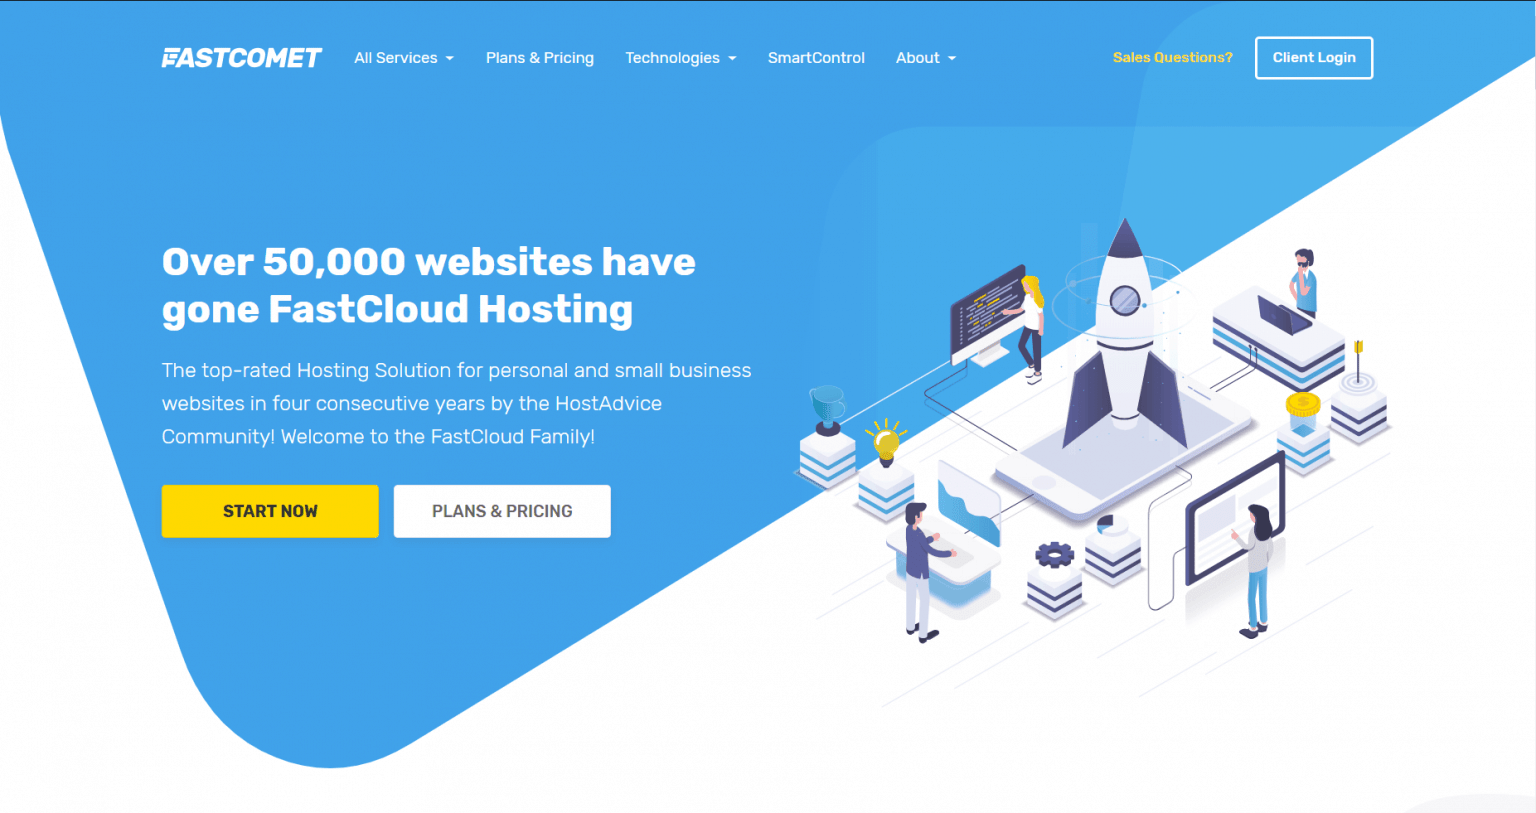 Fastcomet hosting home page